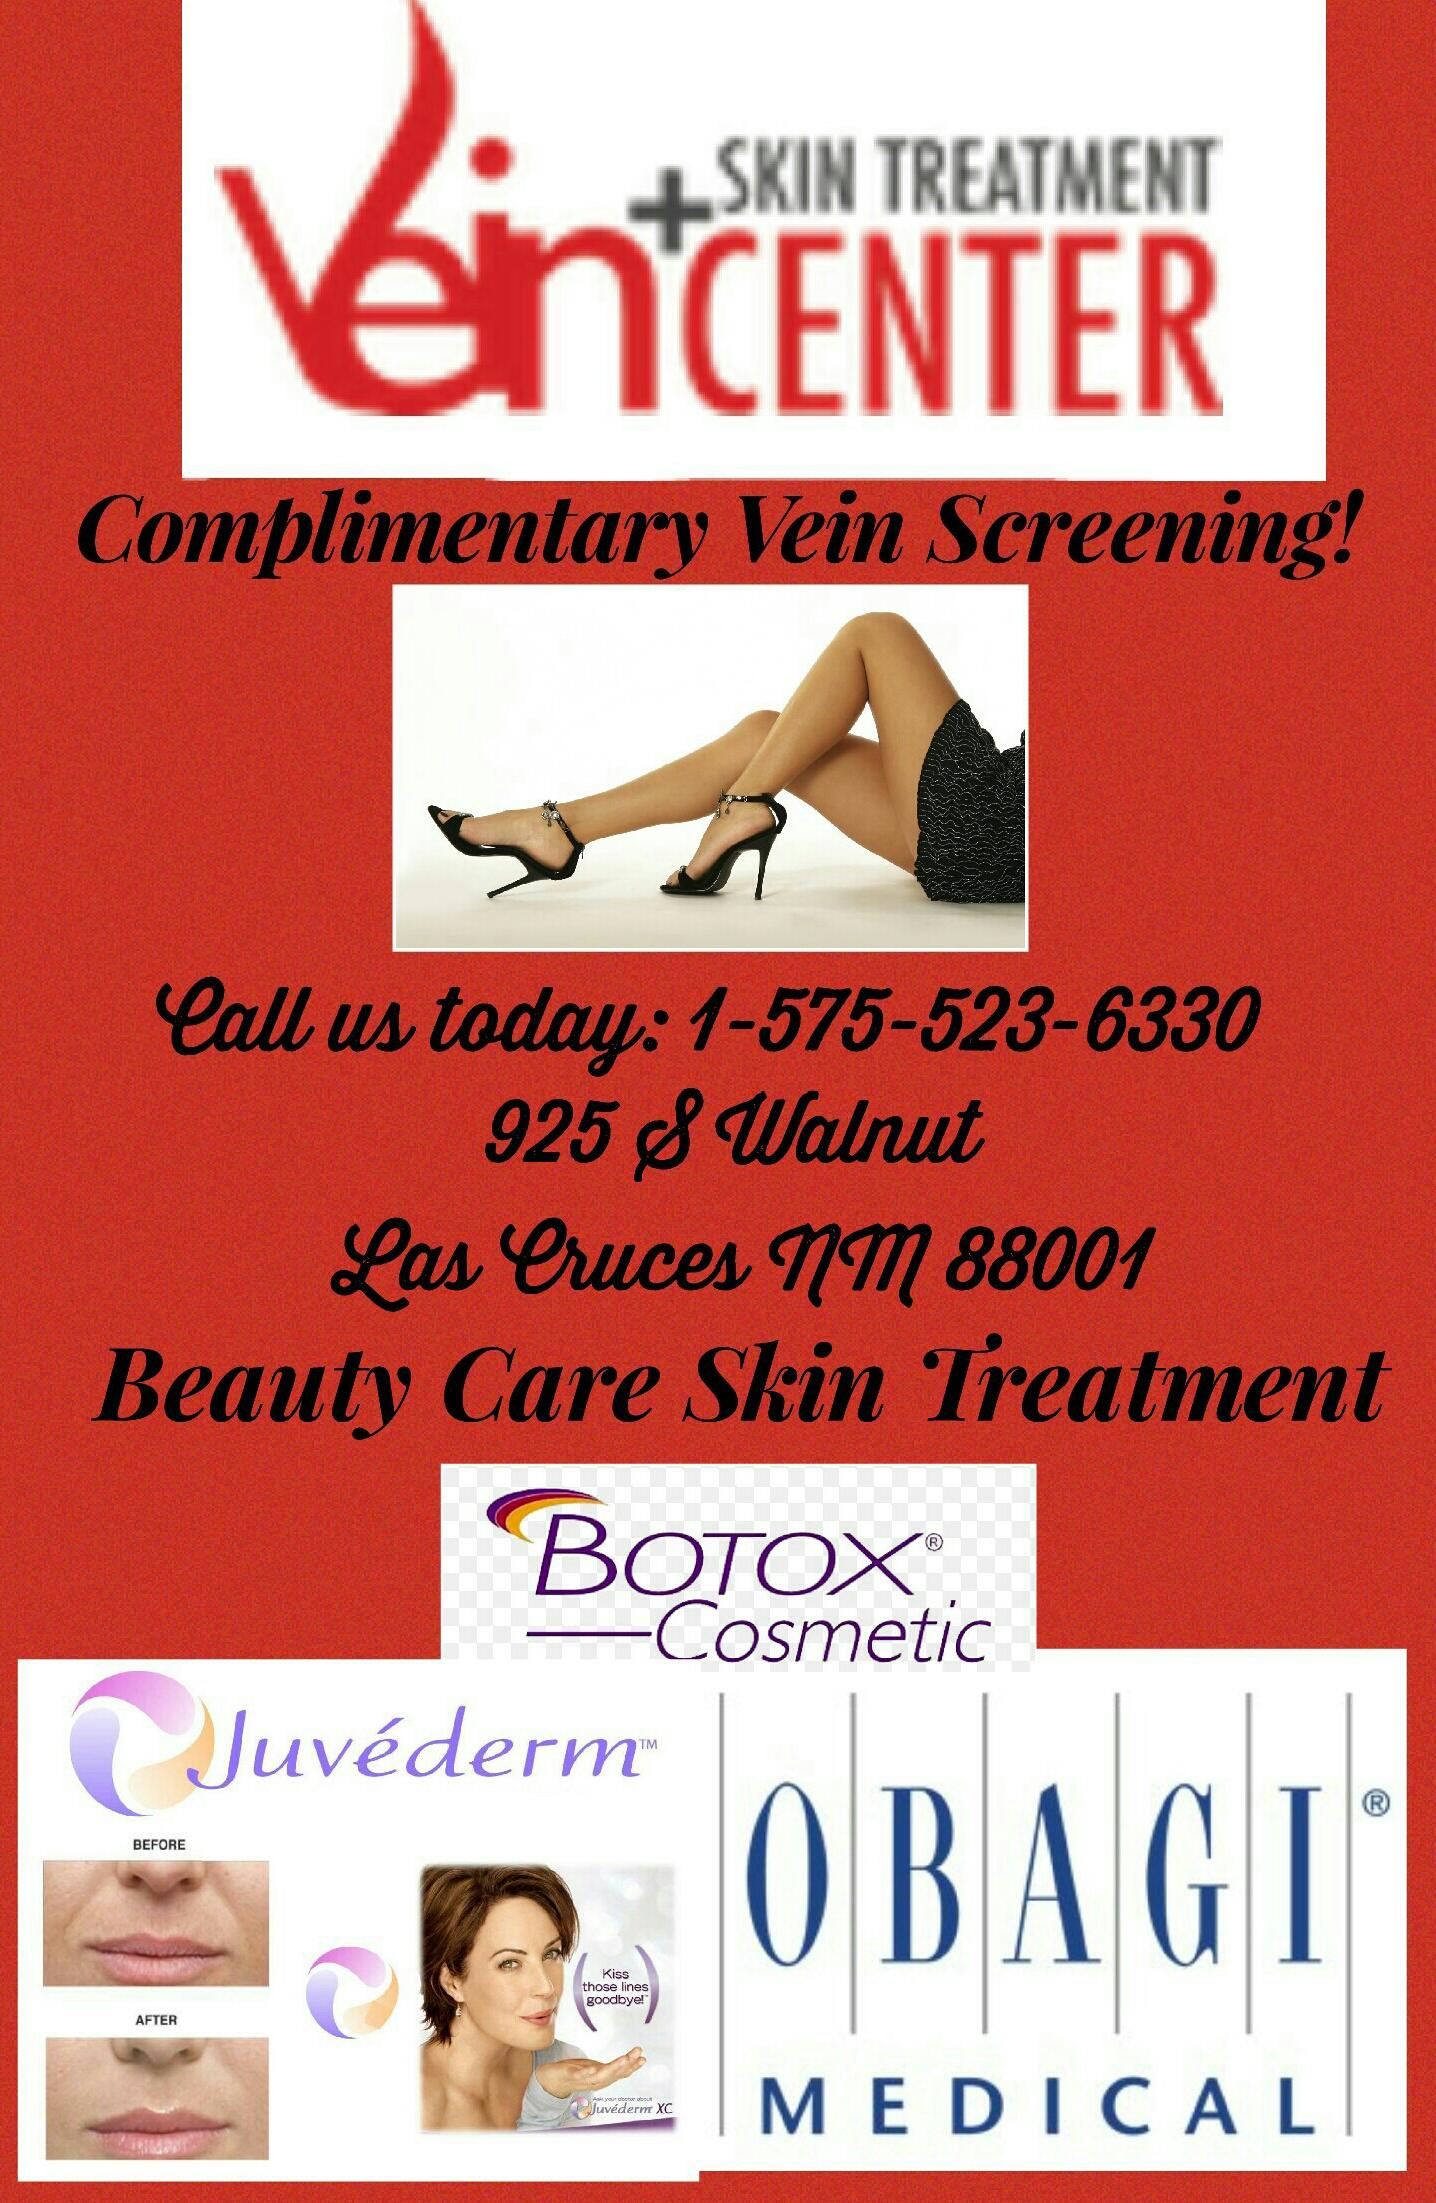 Vein + Skin treatment center in las cruces